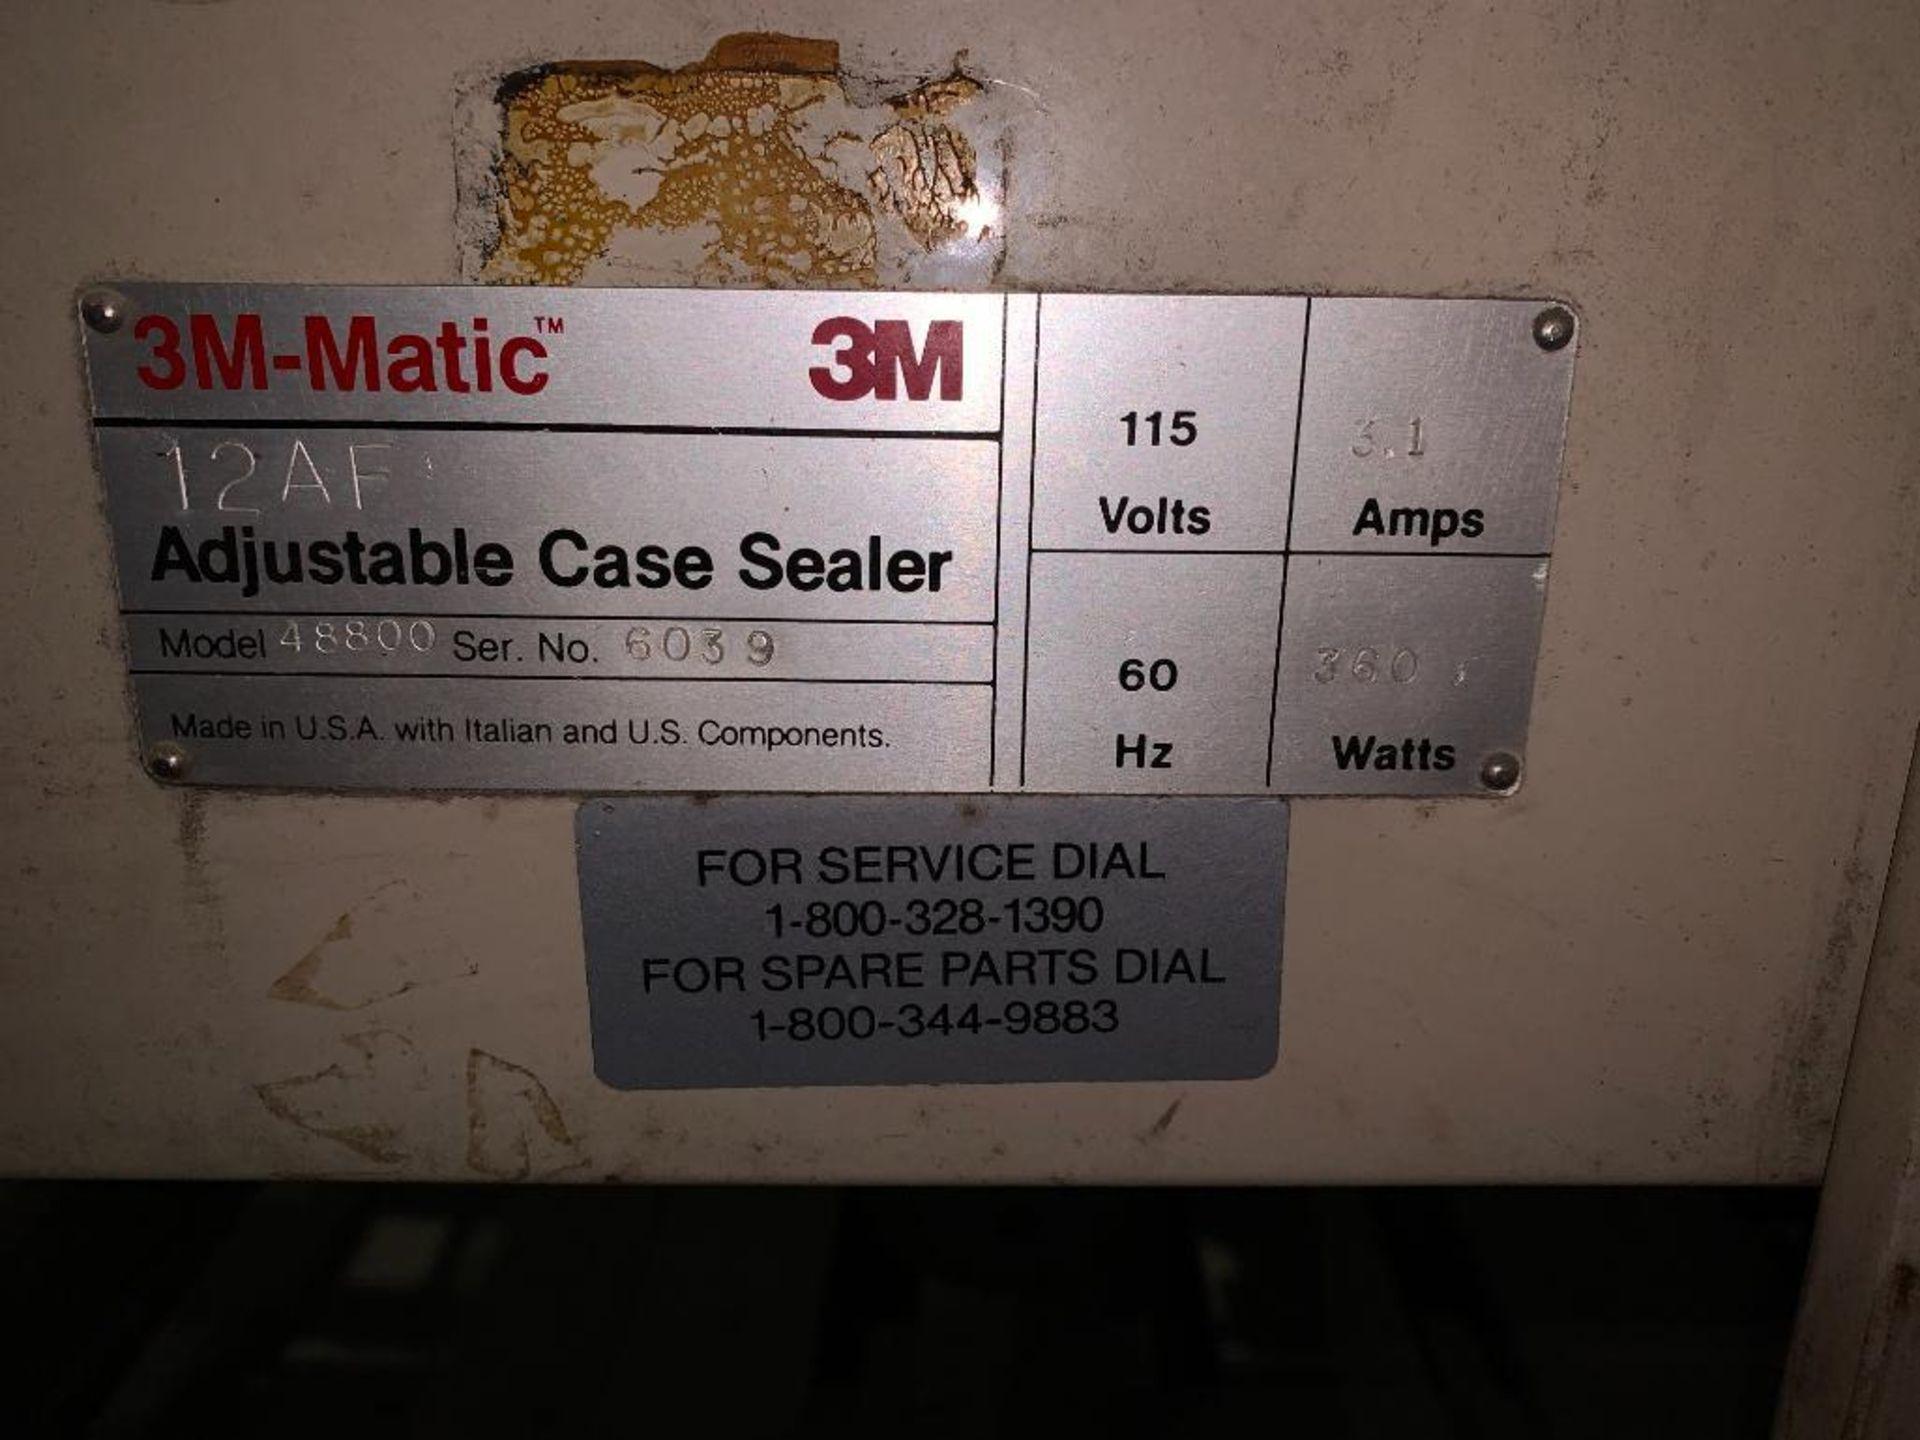 3M-Matic case taper - Image 2 of 15